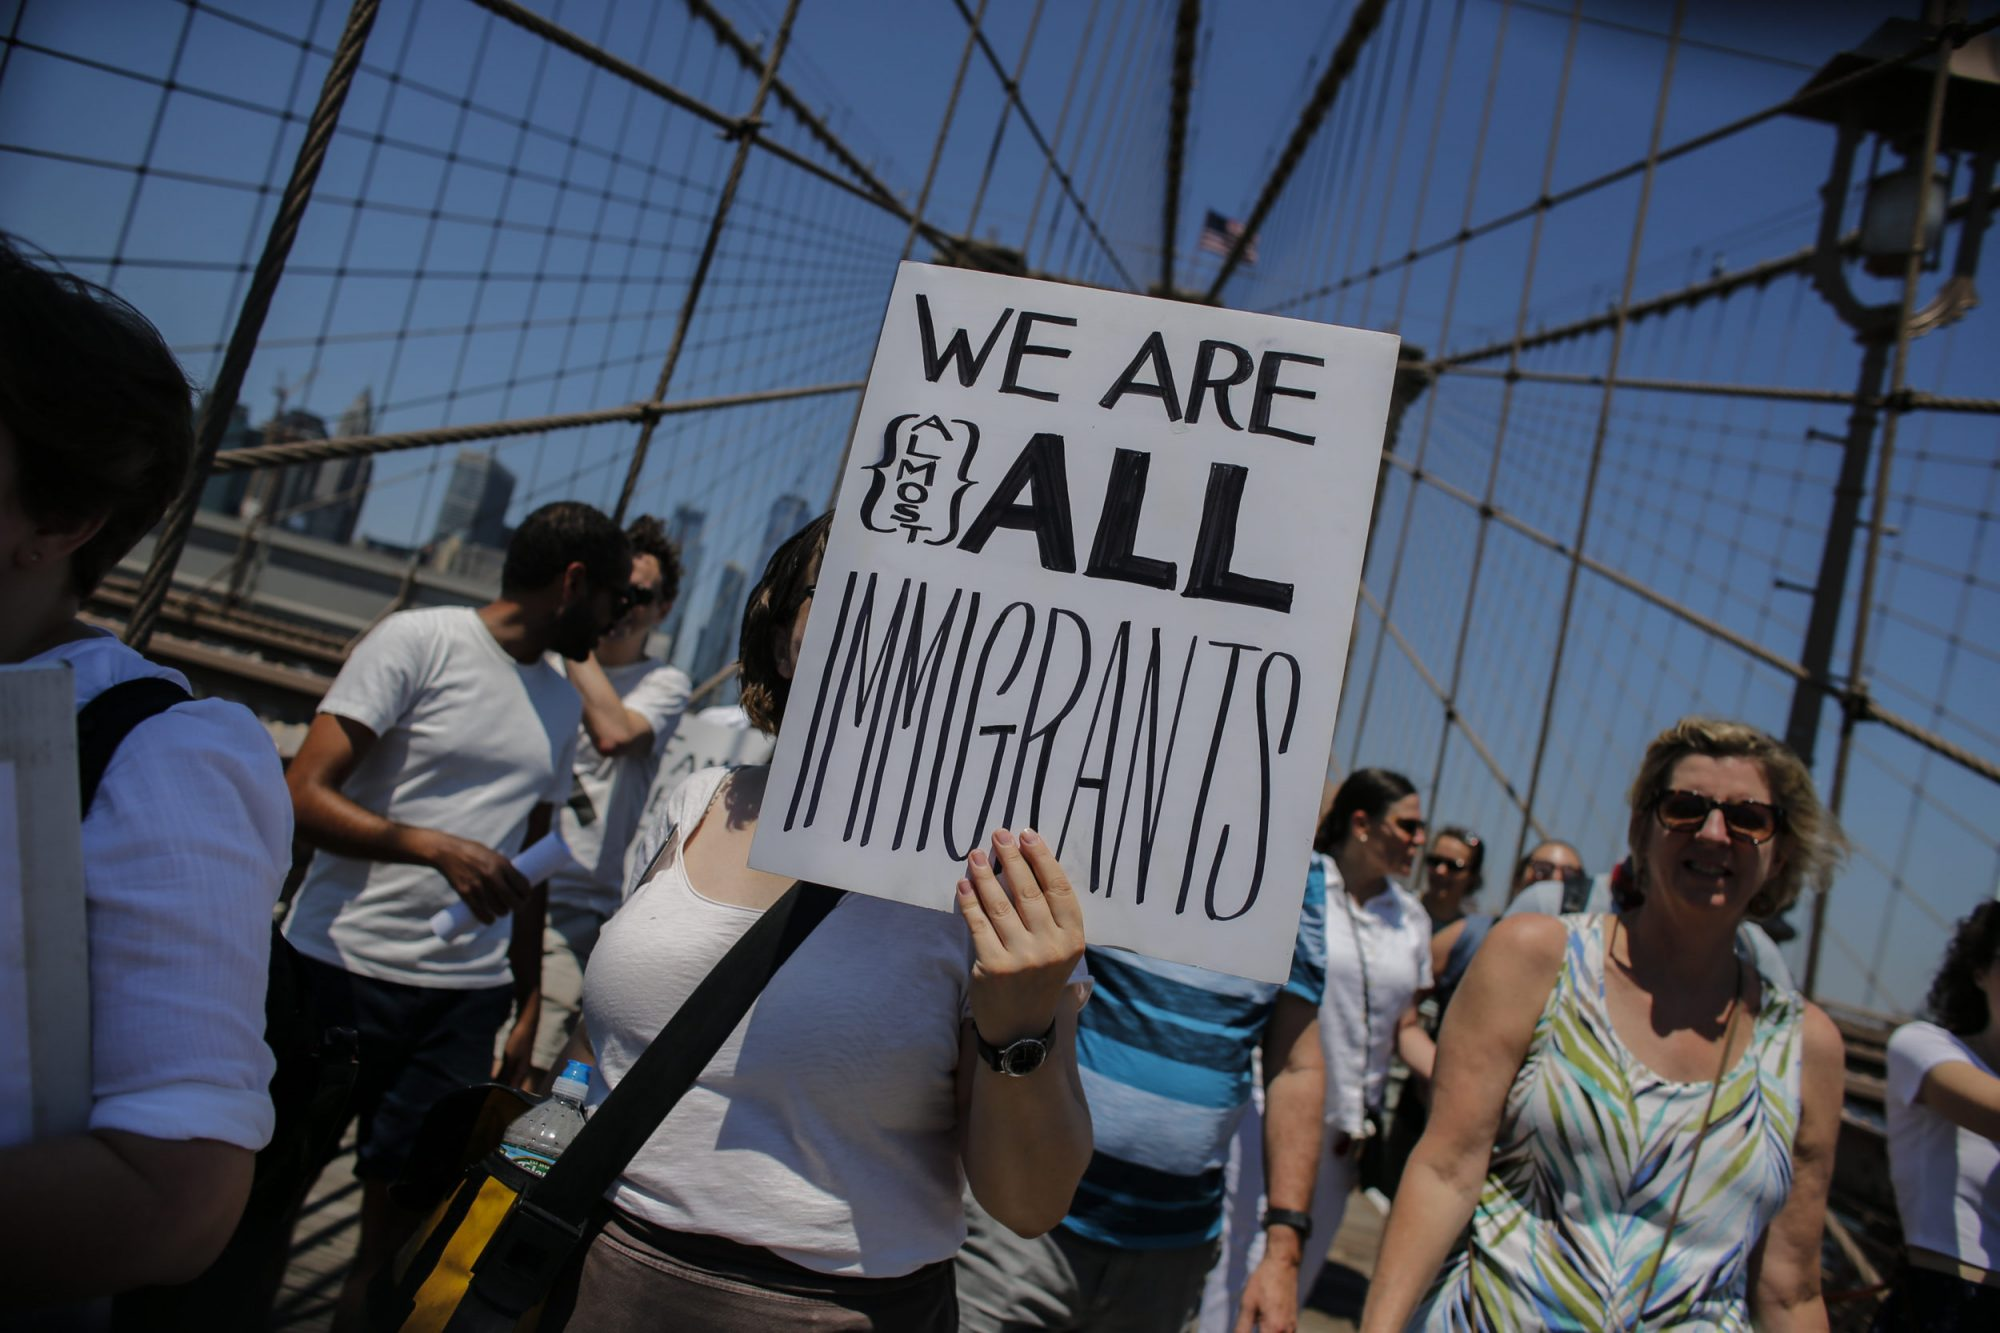 we-are-all-immigrants-e1530383962872.jpg